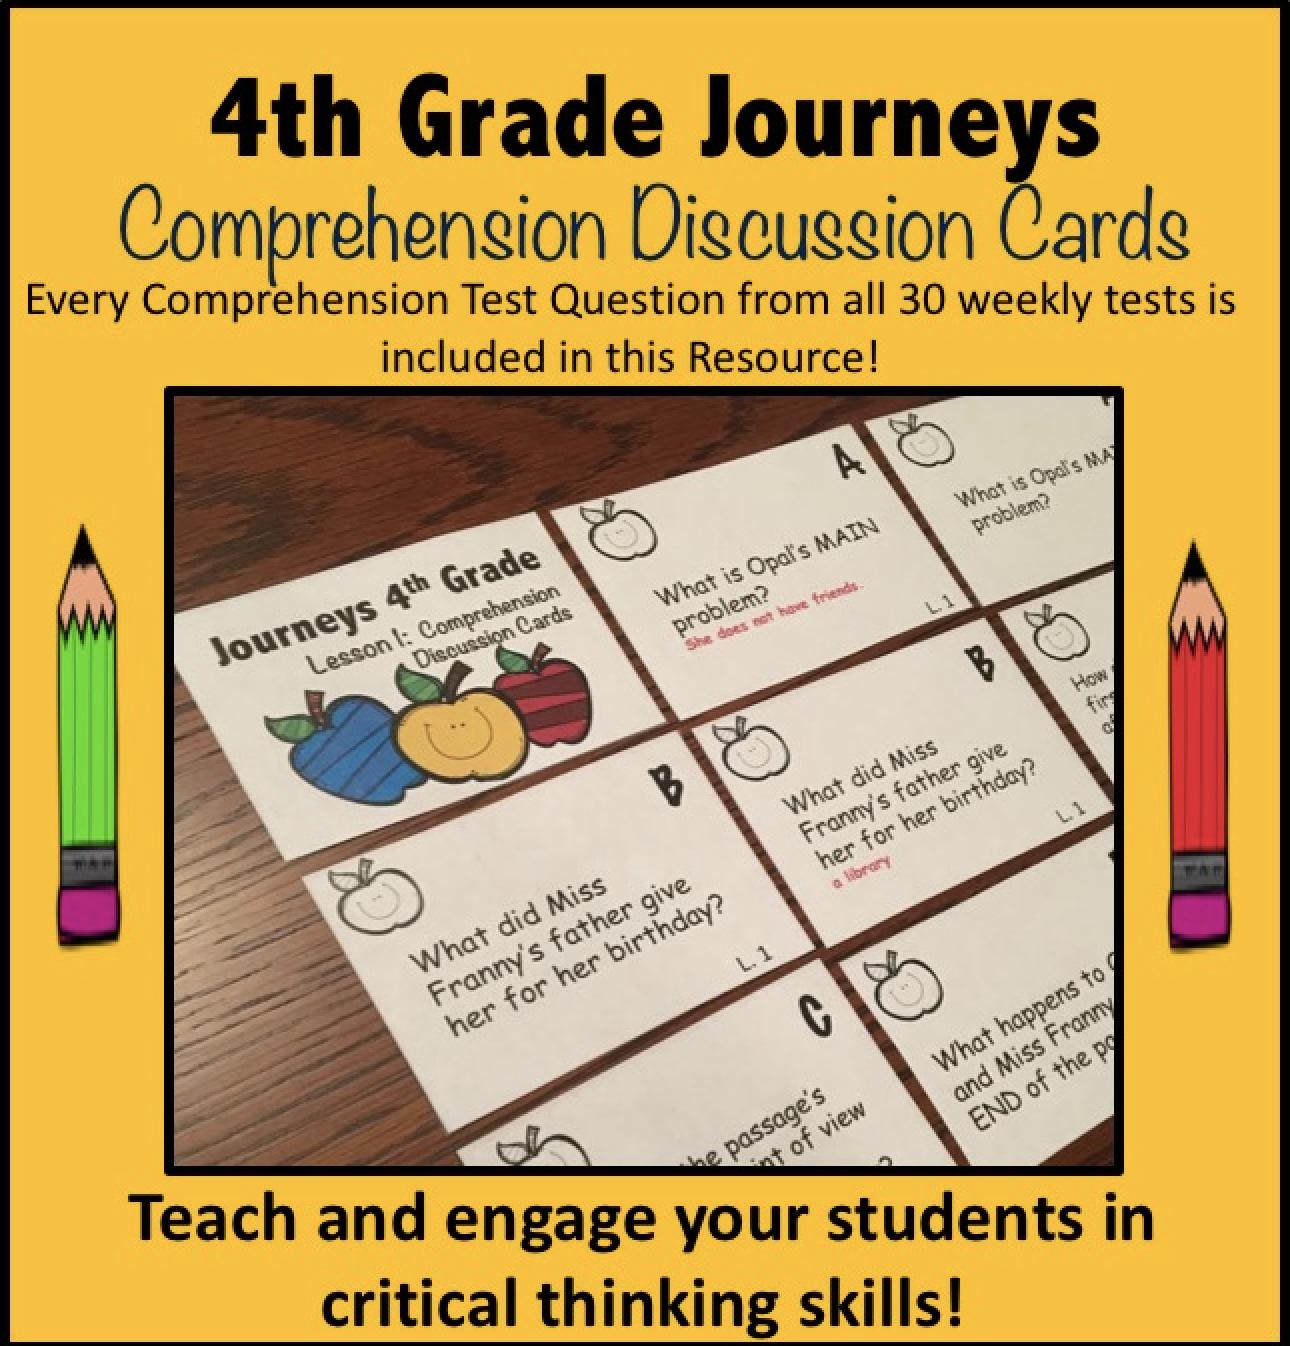 4th Grade Journeys Comprehension Cards